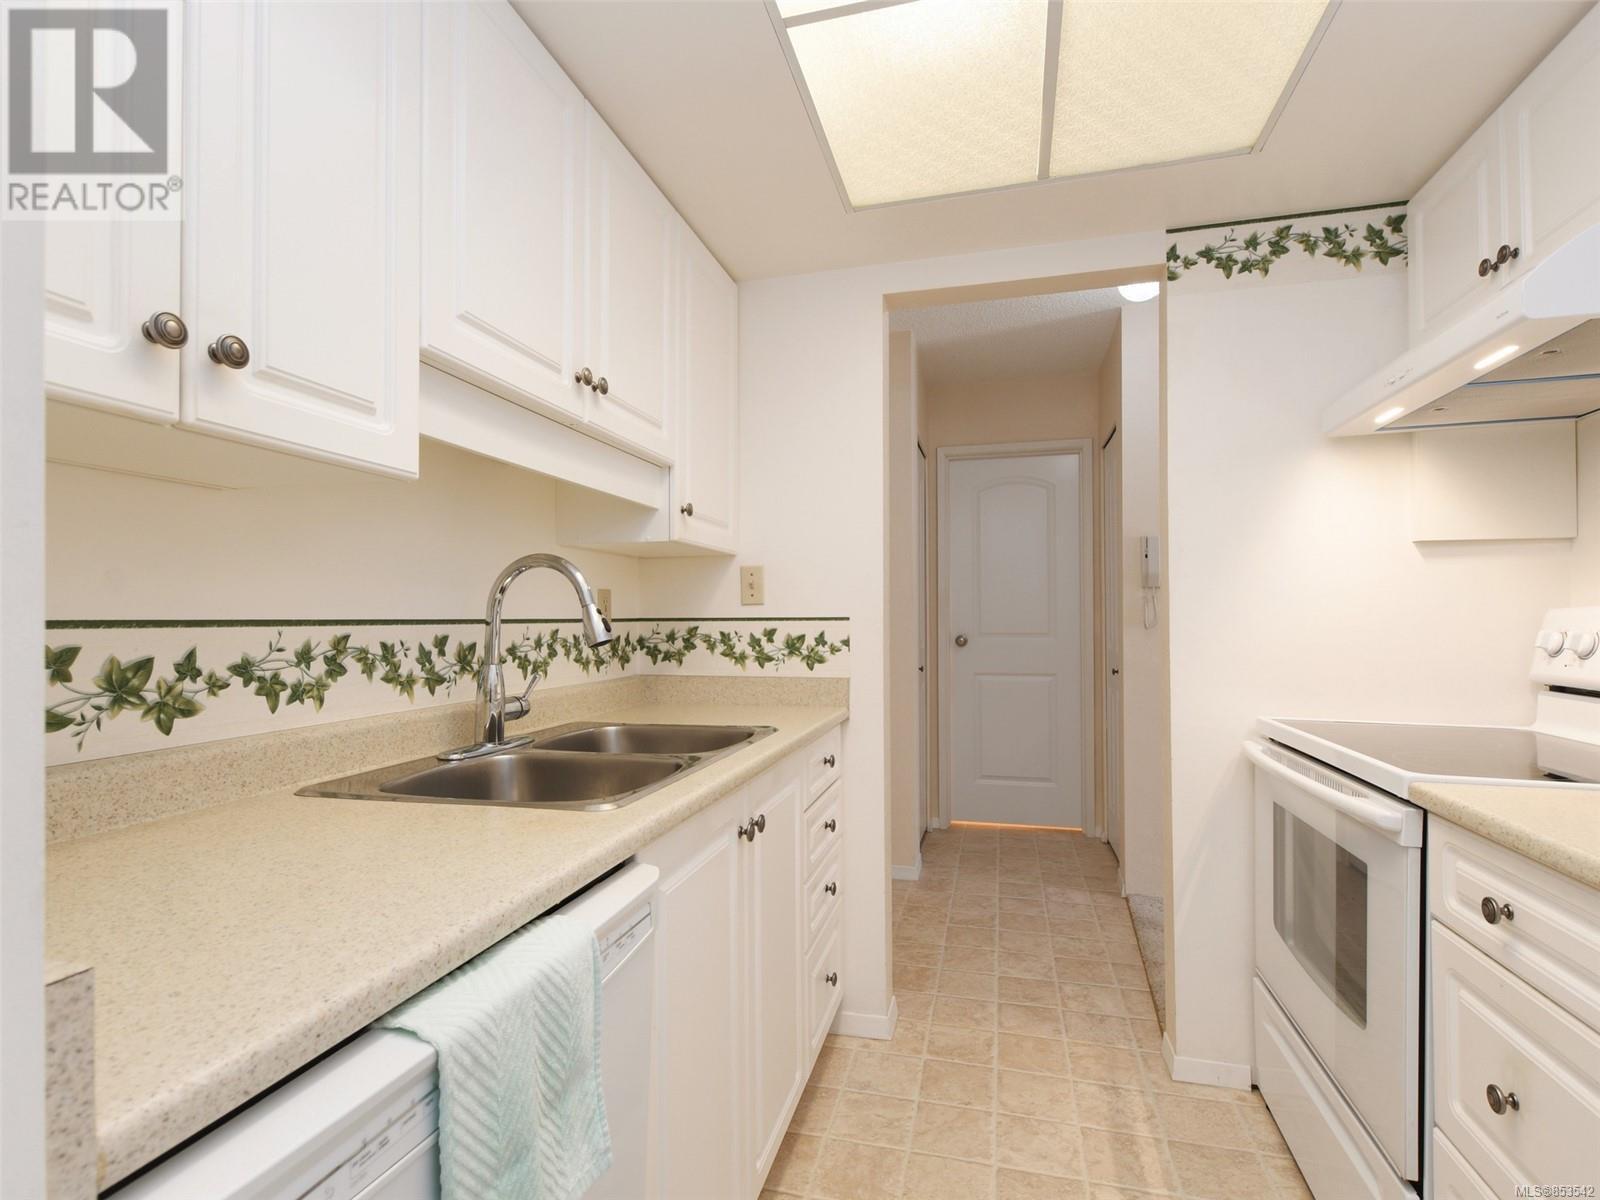 1021 Collinson St 303 | Apartment 出售 | Realmaster.com